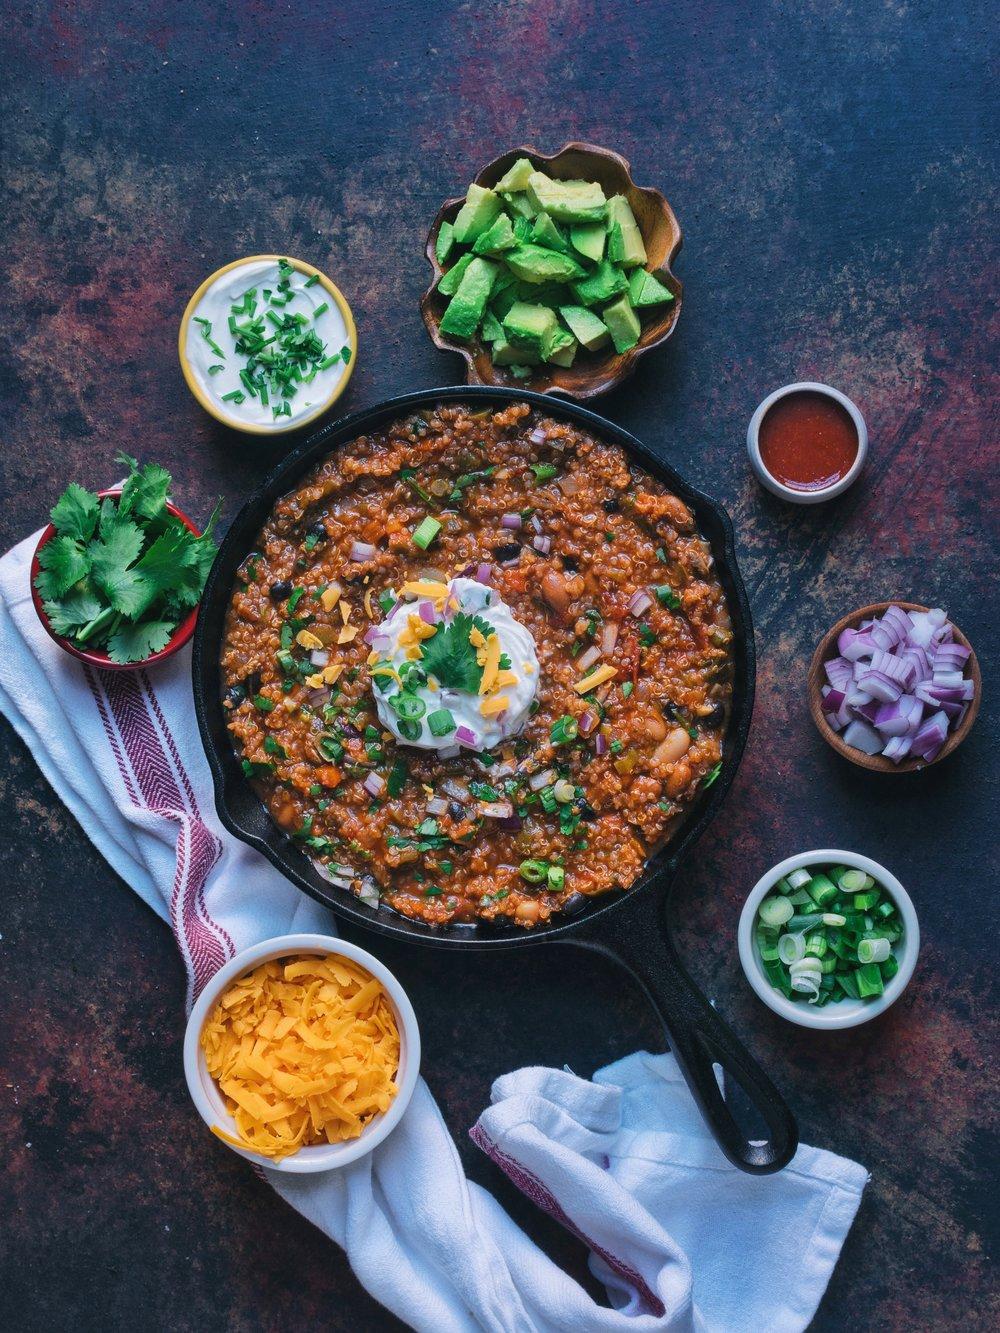 Hearty Lentil &Quinoa Chili - Vegan, Gluten-Free